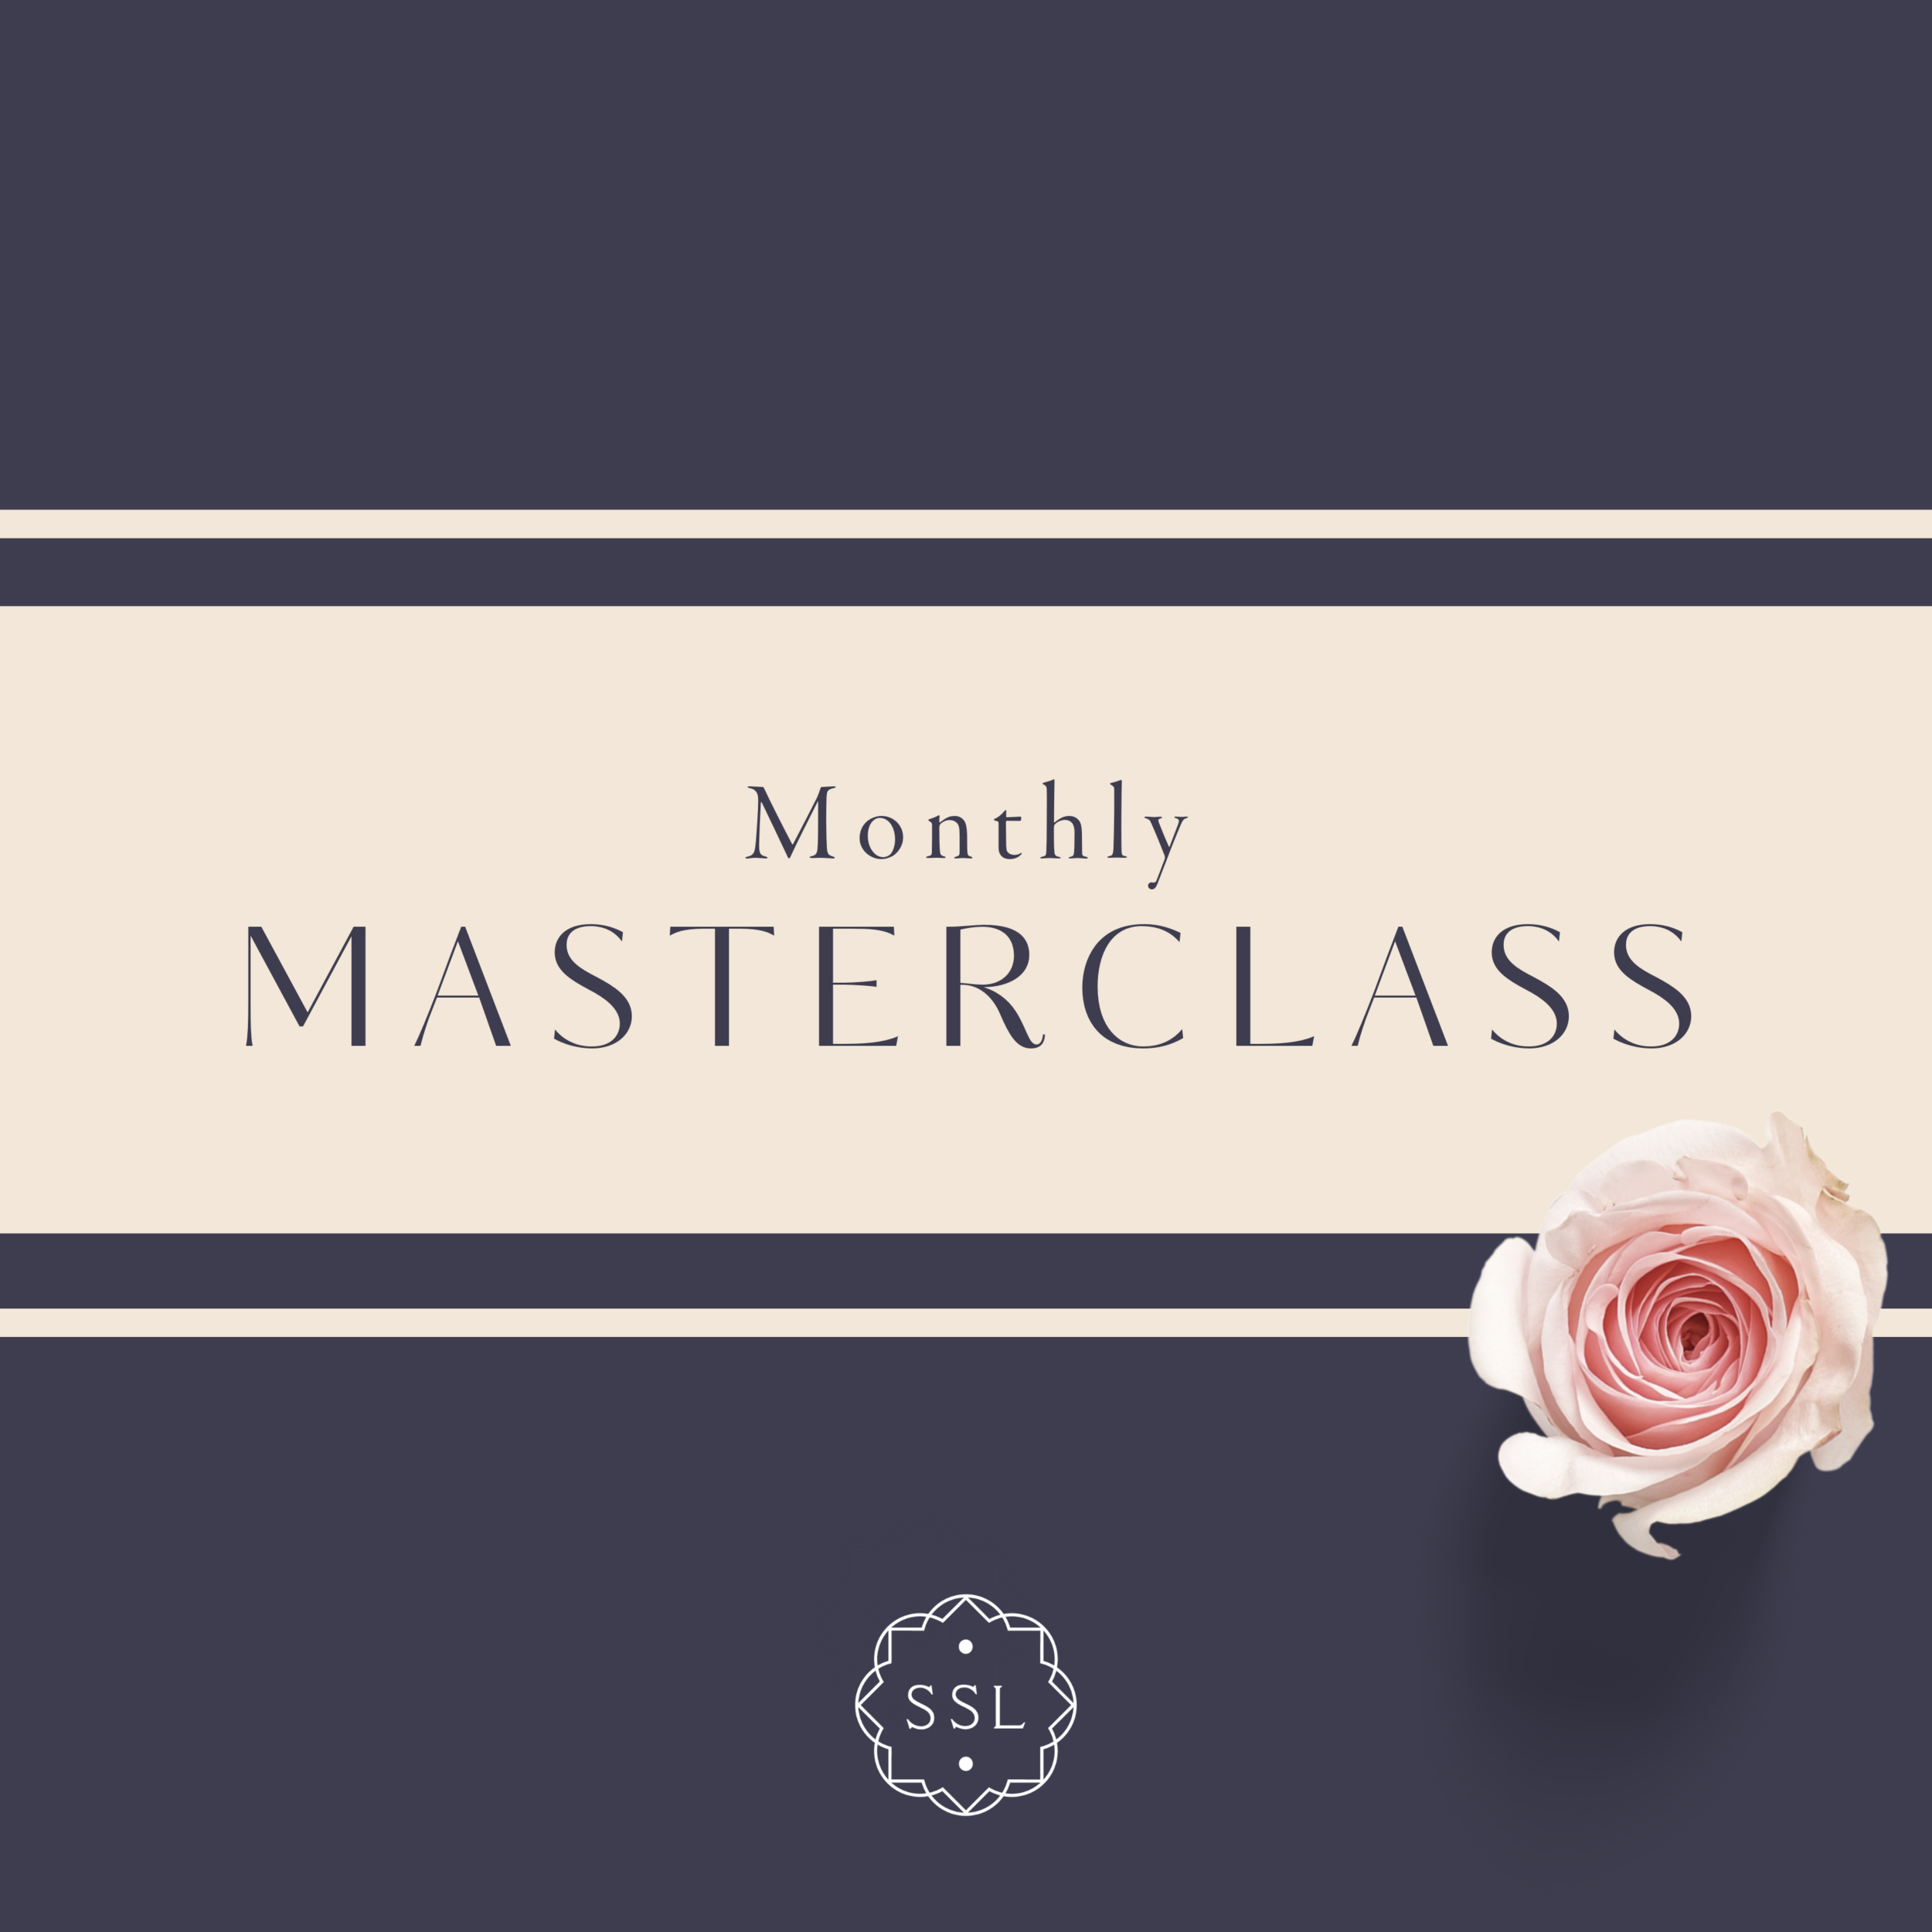 masterclass.png